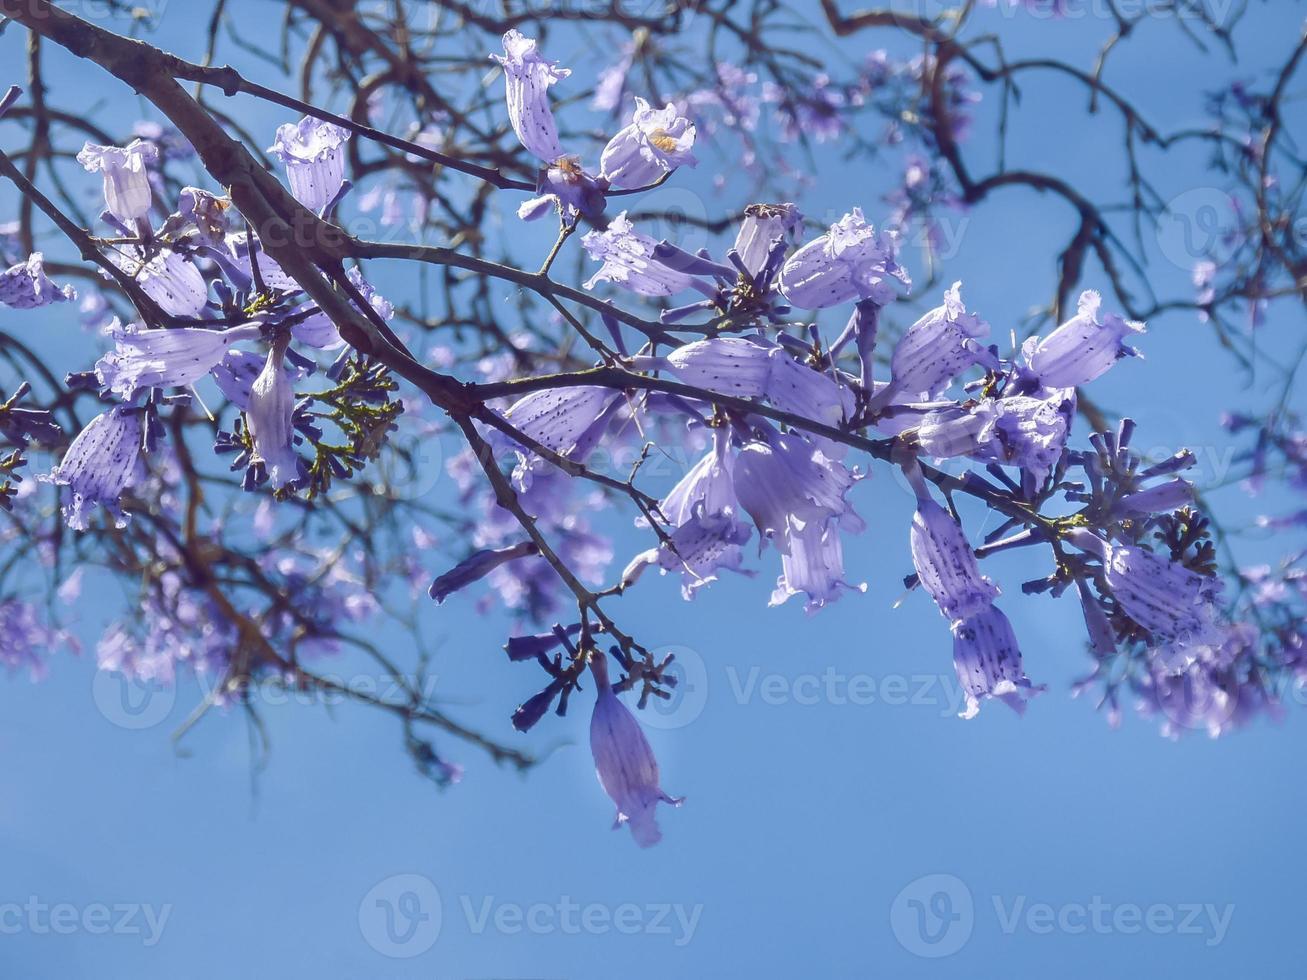 violette Blumen gegen blauen Himmel foto